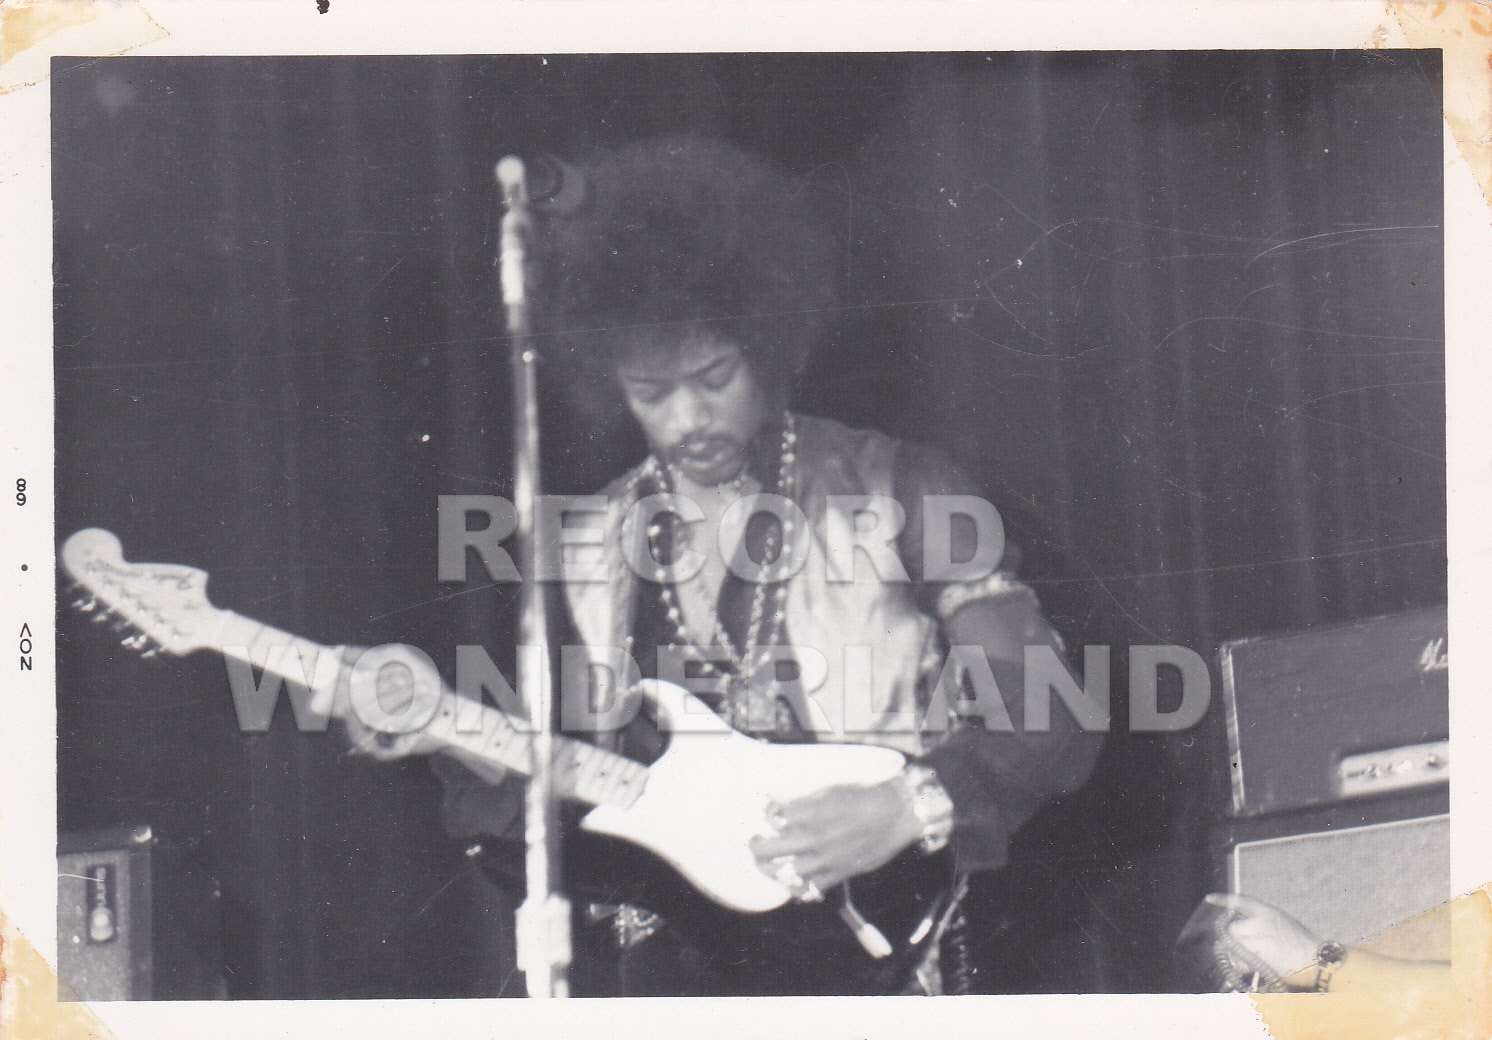 St Louis (Kiel Auditorium) : 3 novembre 1968  0b924b32a9b1e5375af2896668ff01a7